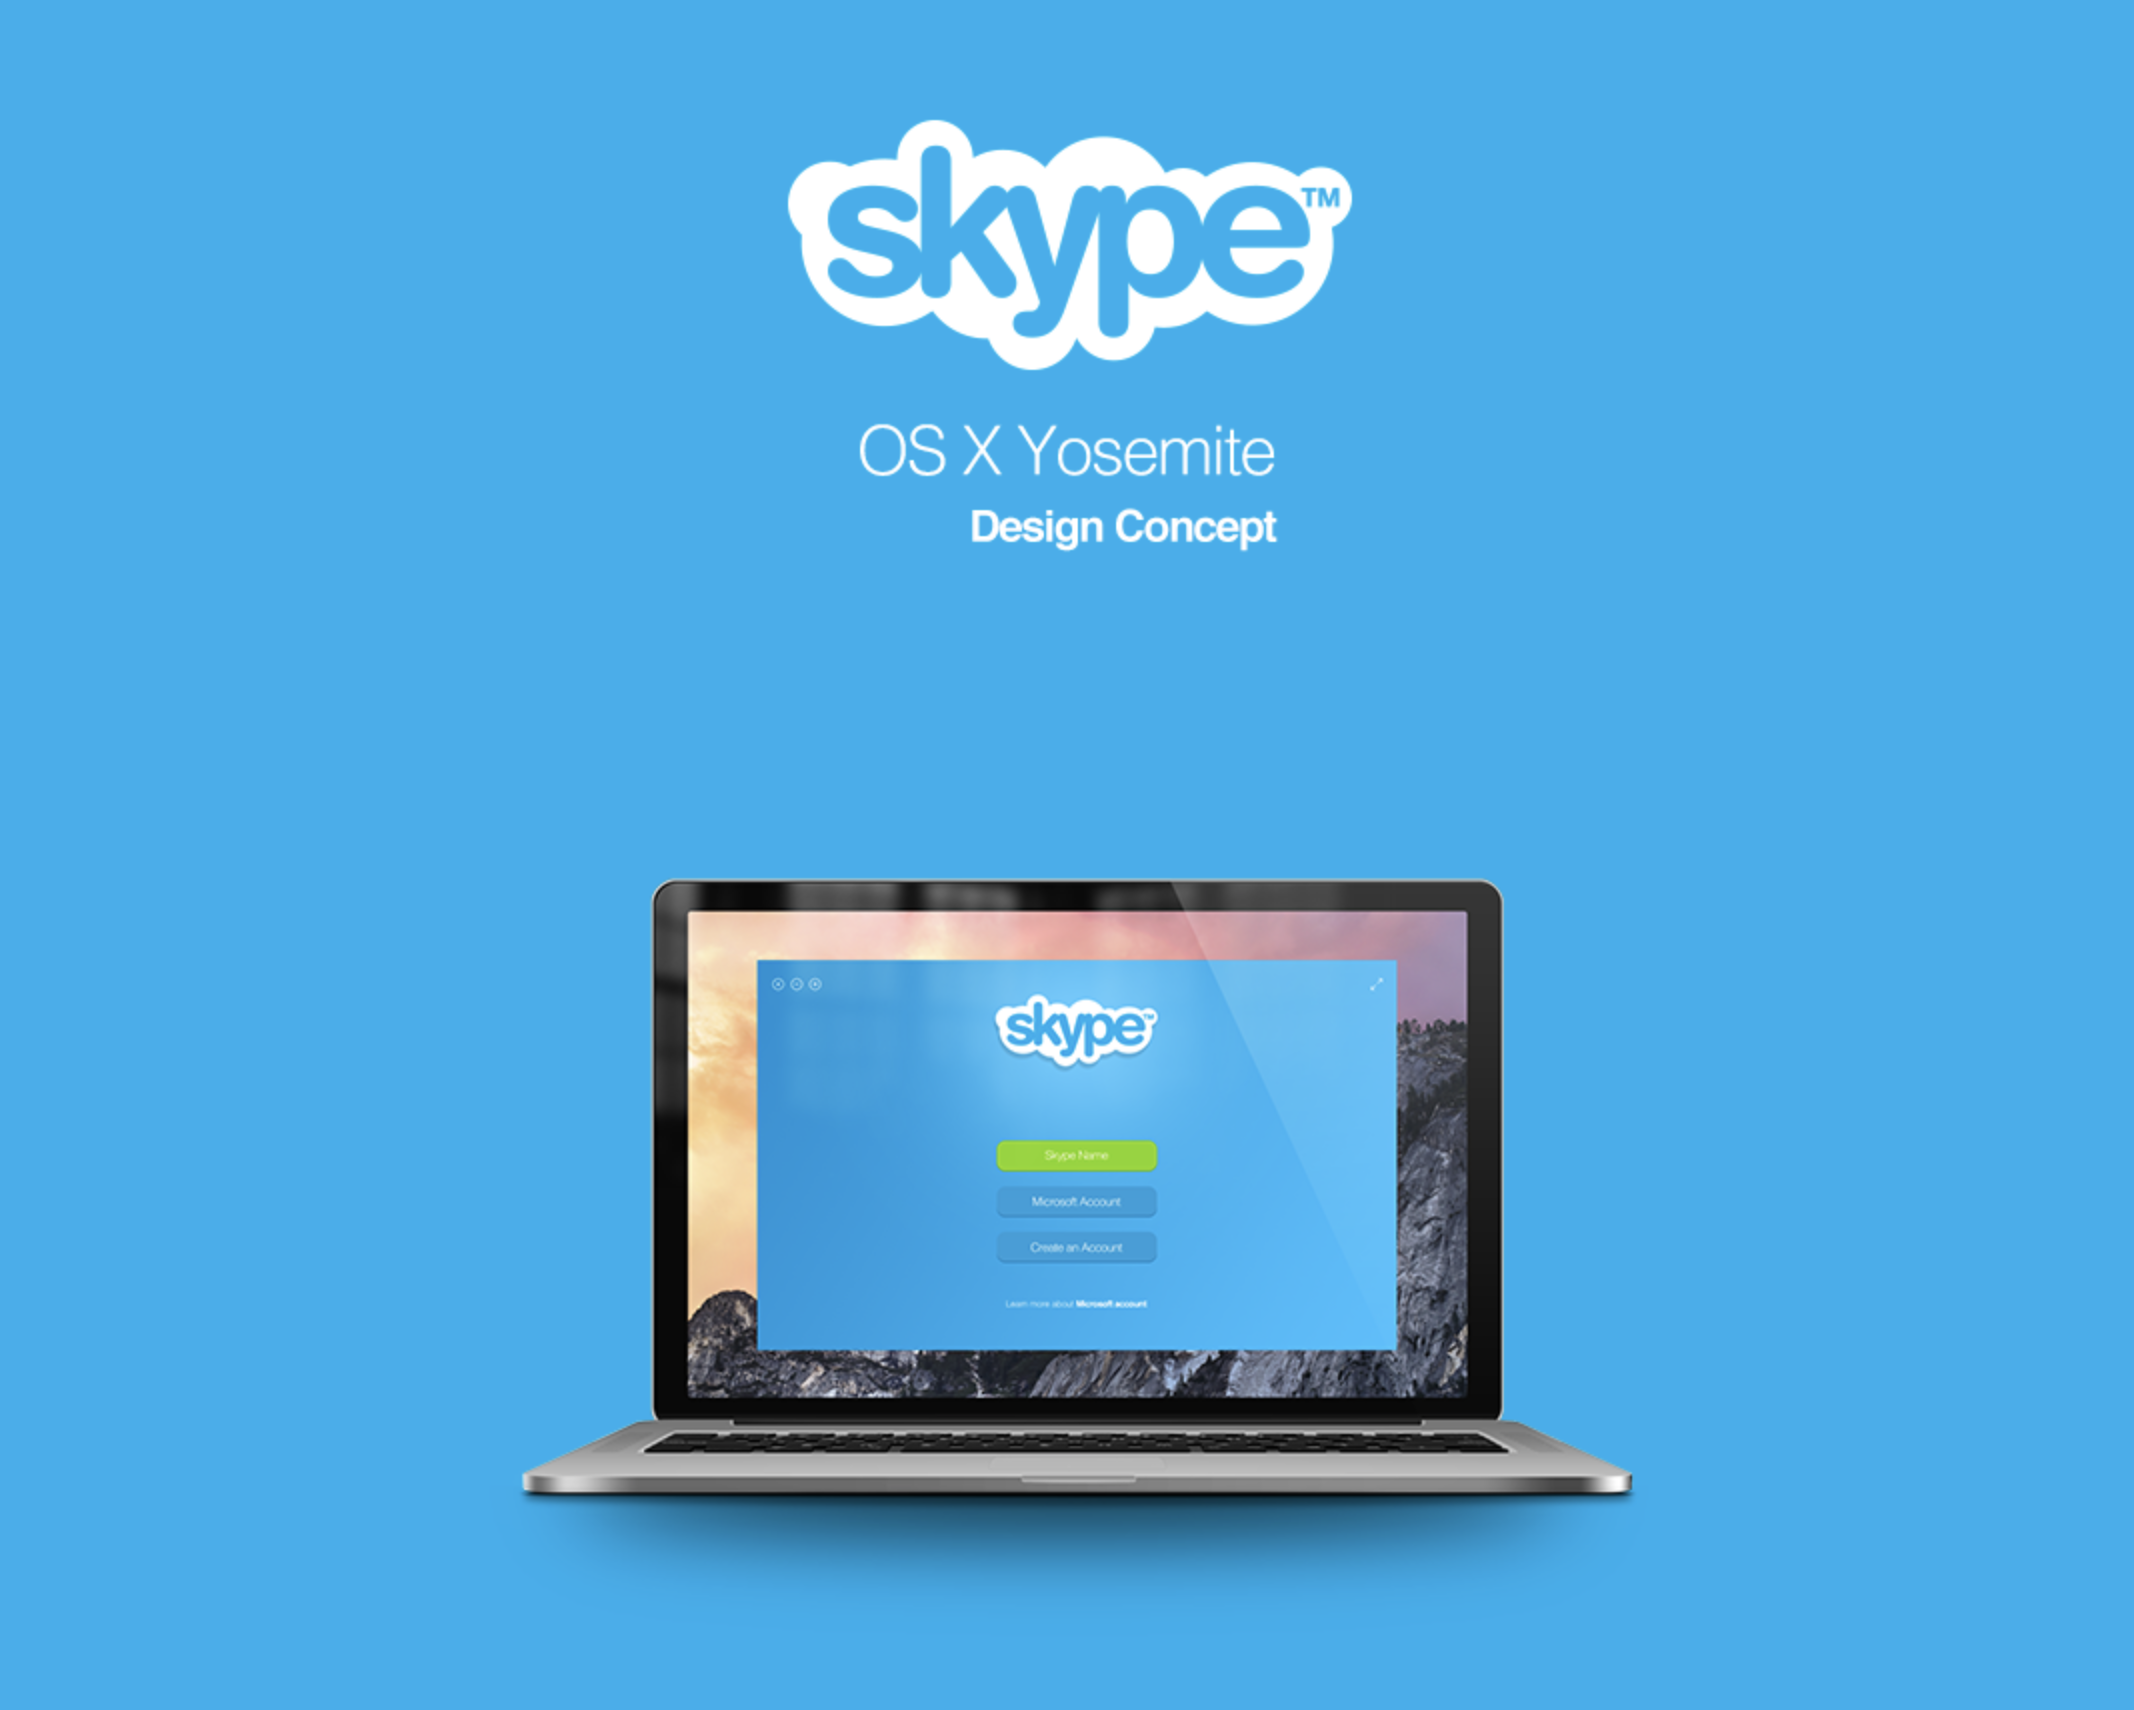 Skype OS X Yosemite App Design Concept